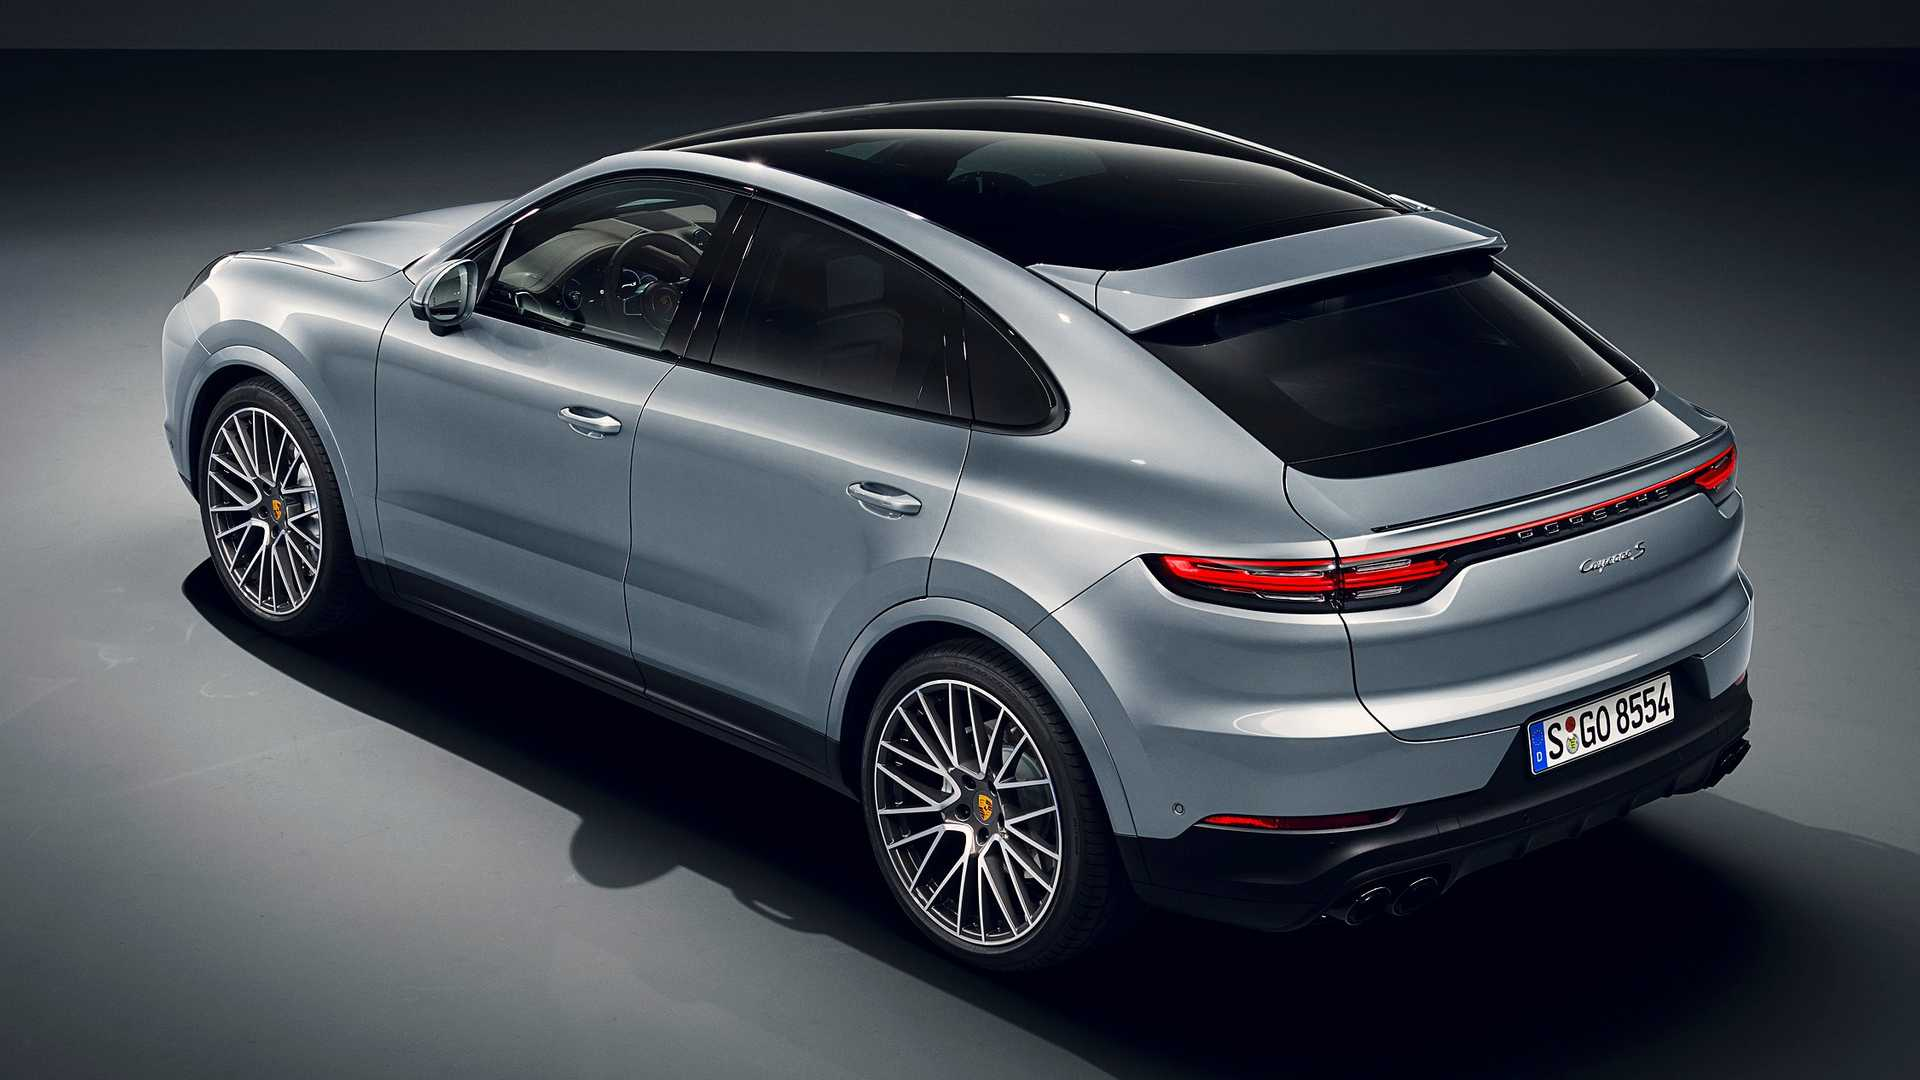 Porsche-Cayenne-S-Coupe-3